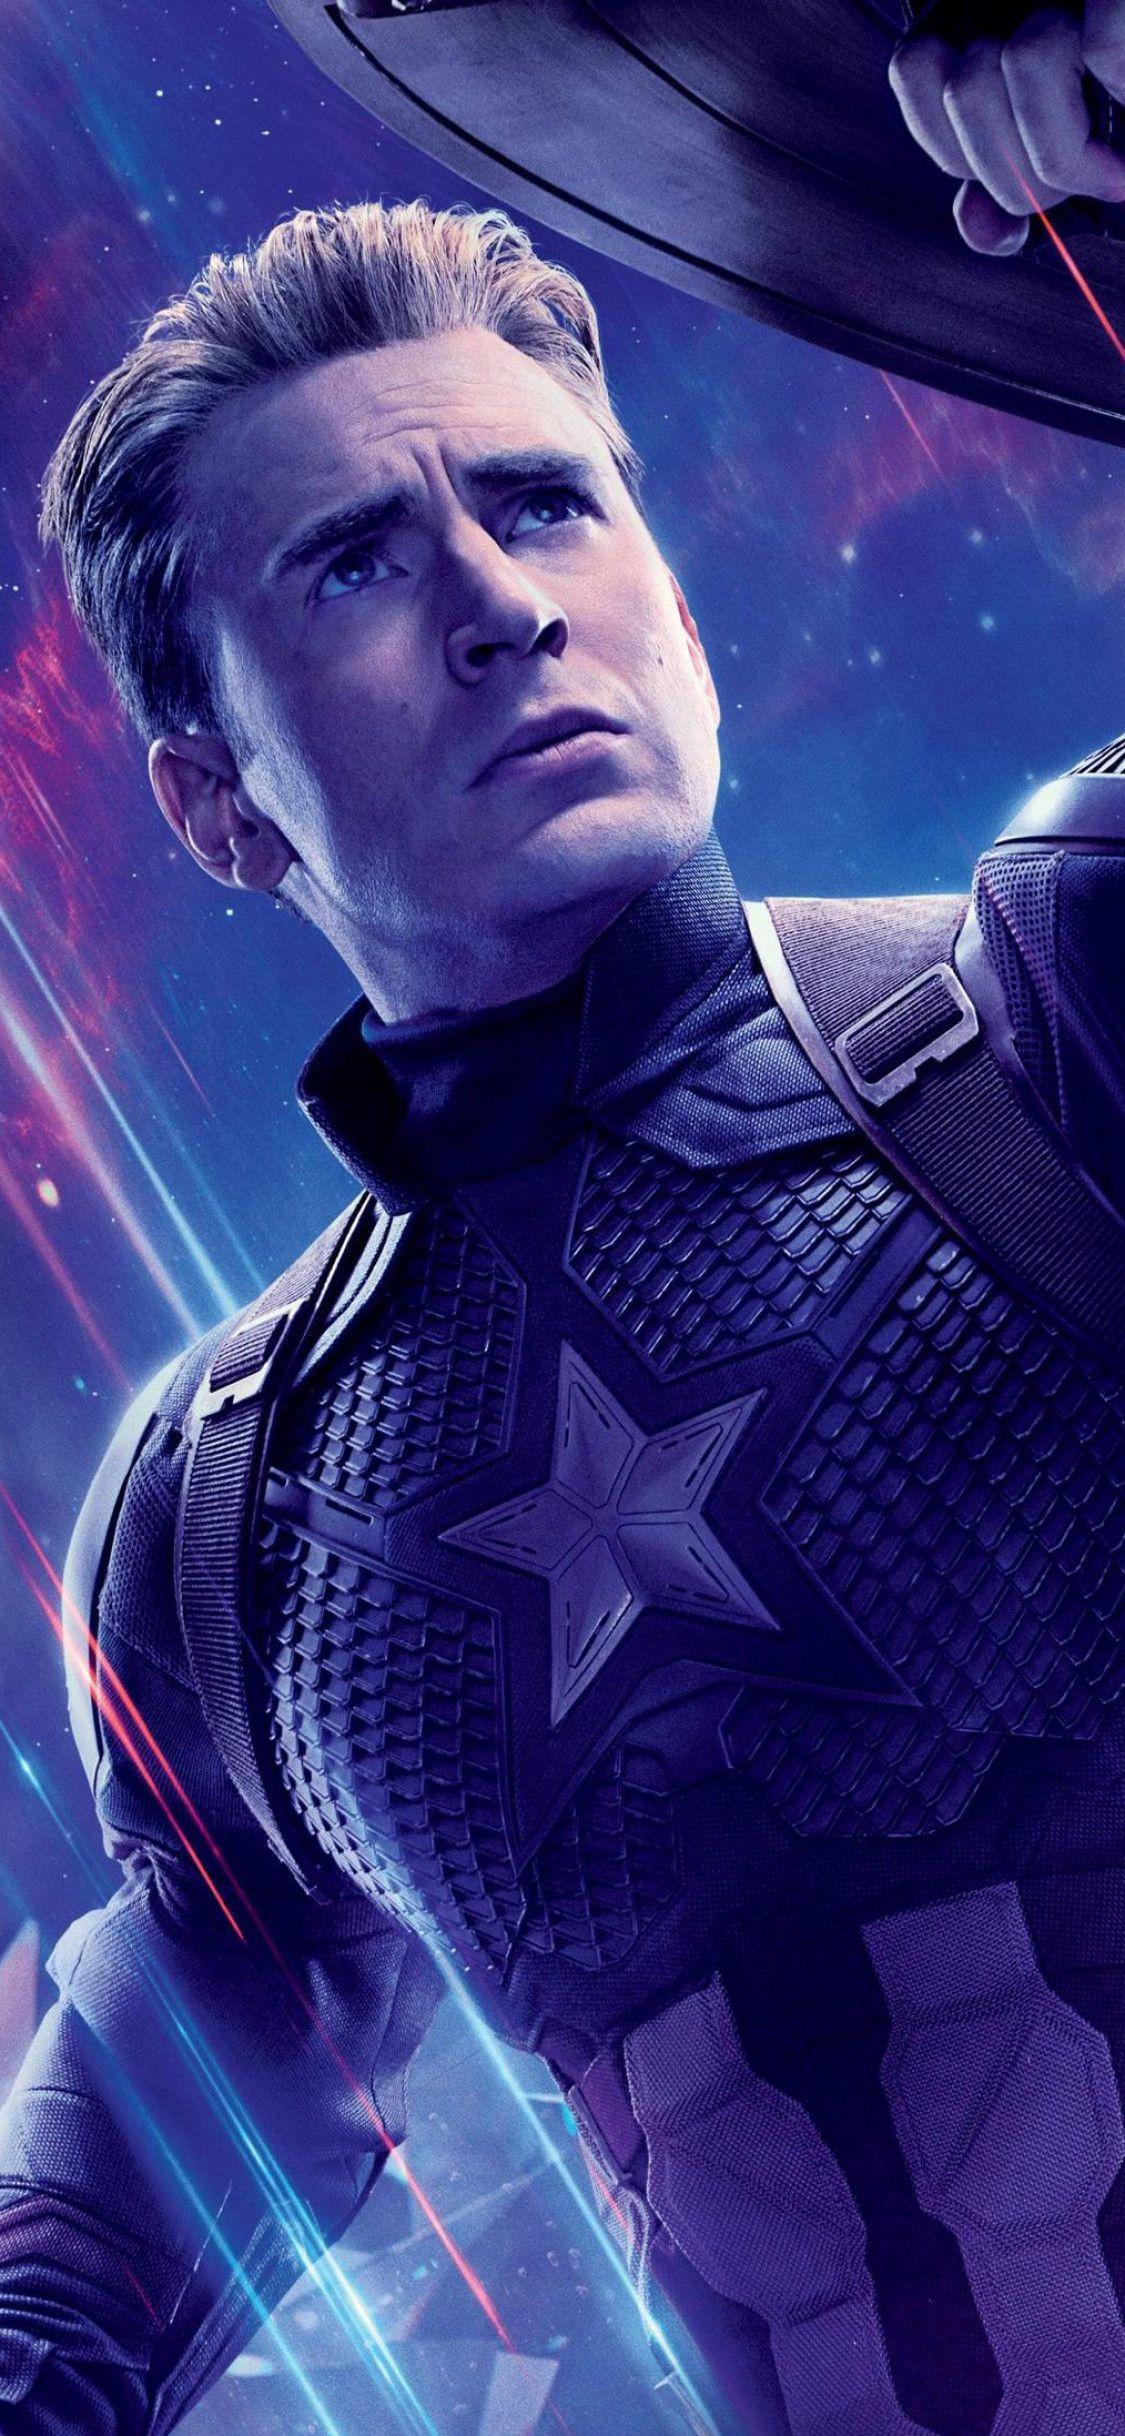 1125x2436 Captain America In Avengers Endgame Iphone Xs Iphone 10 Iphone X Hd 4k Wallpapers Imag Captain America Wallpaper Marvel Photo Marvel Captain America